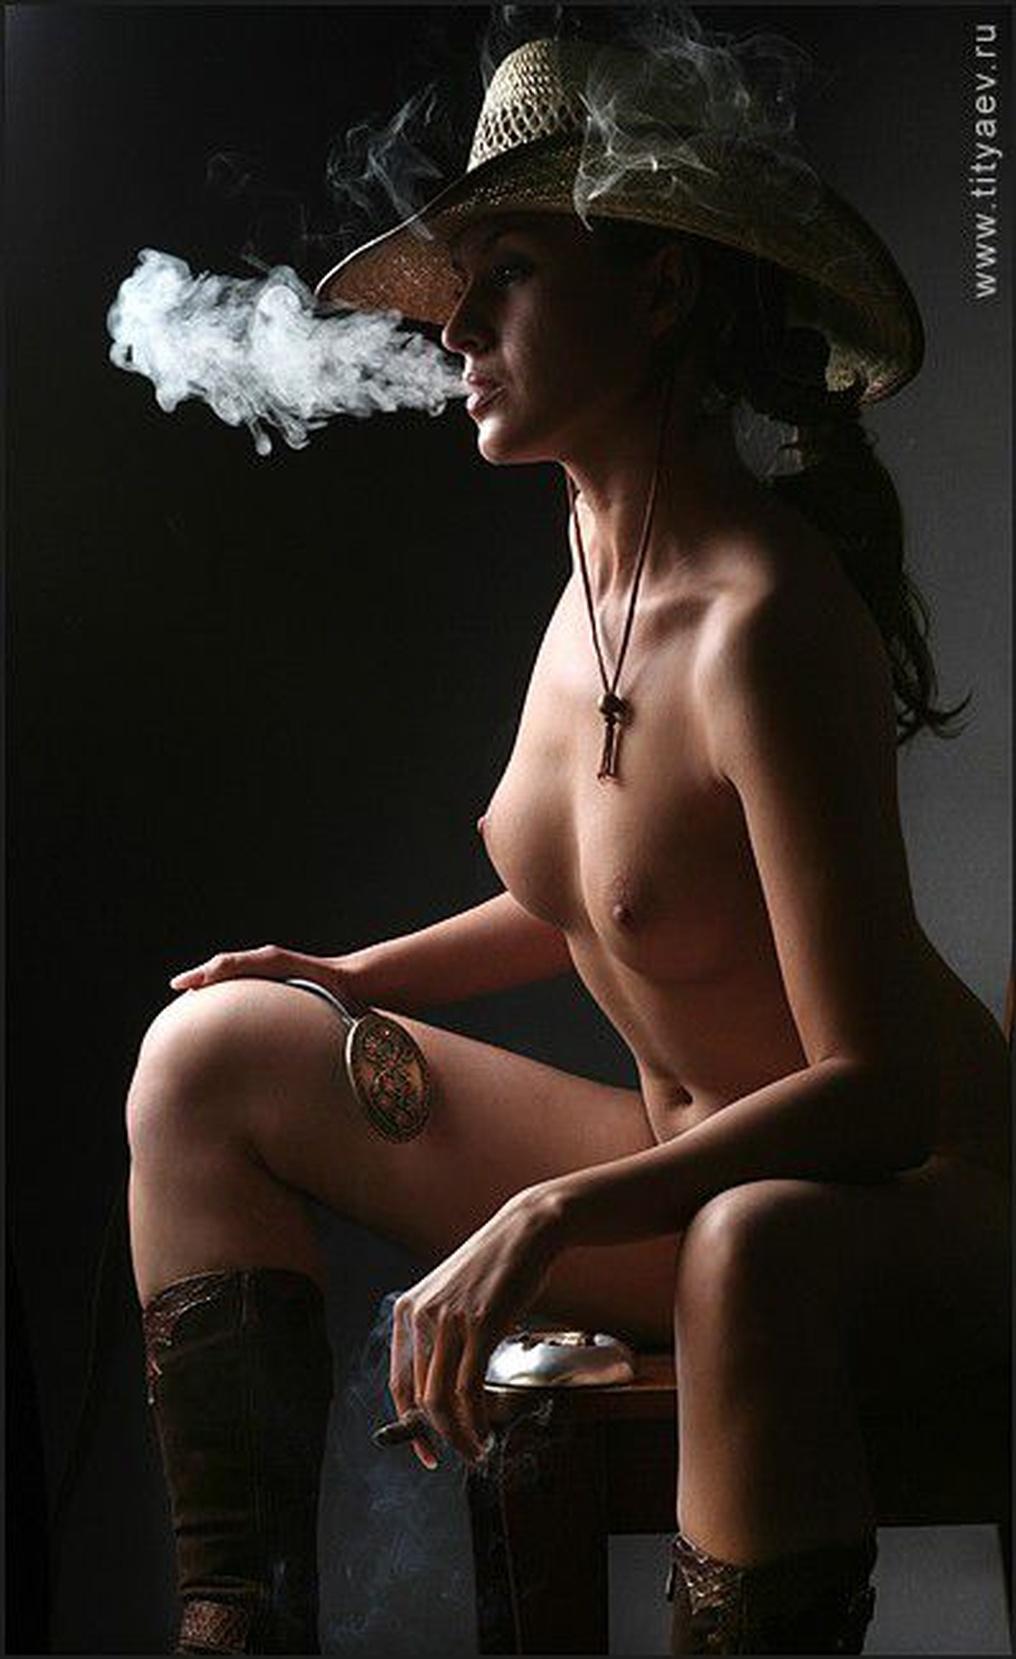 nude-girls-cigarettes-bbw-bi-sex